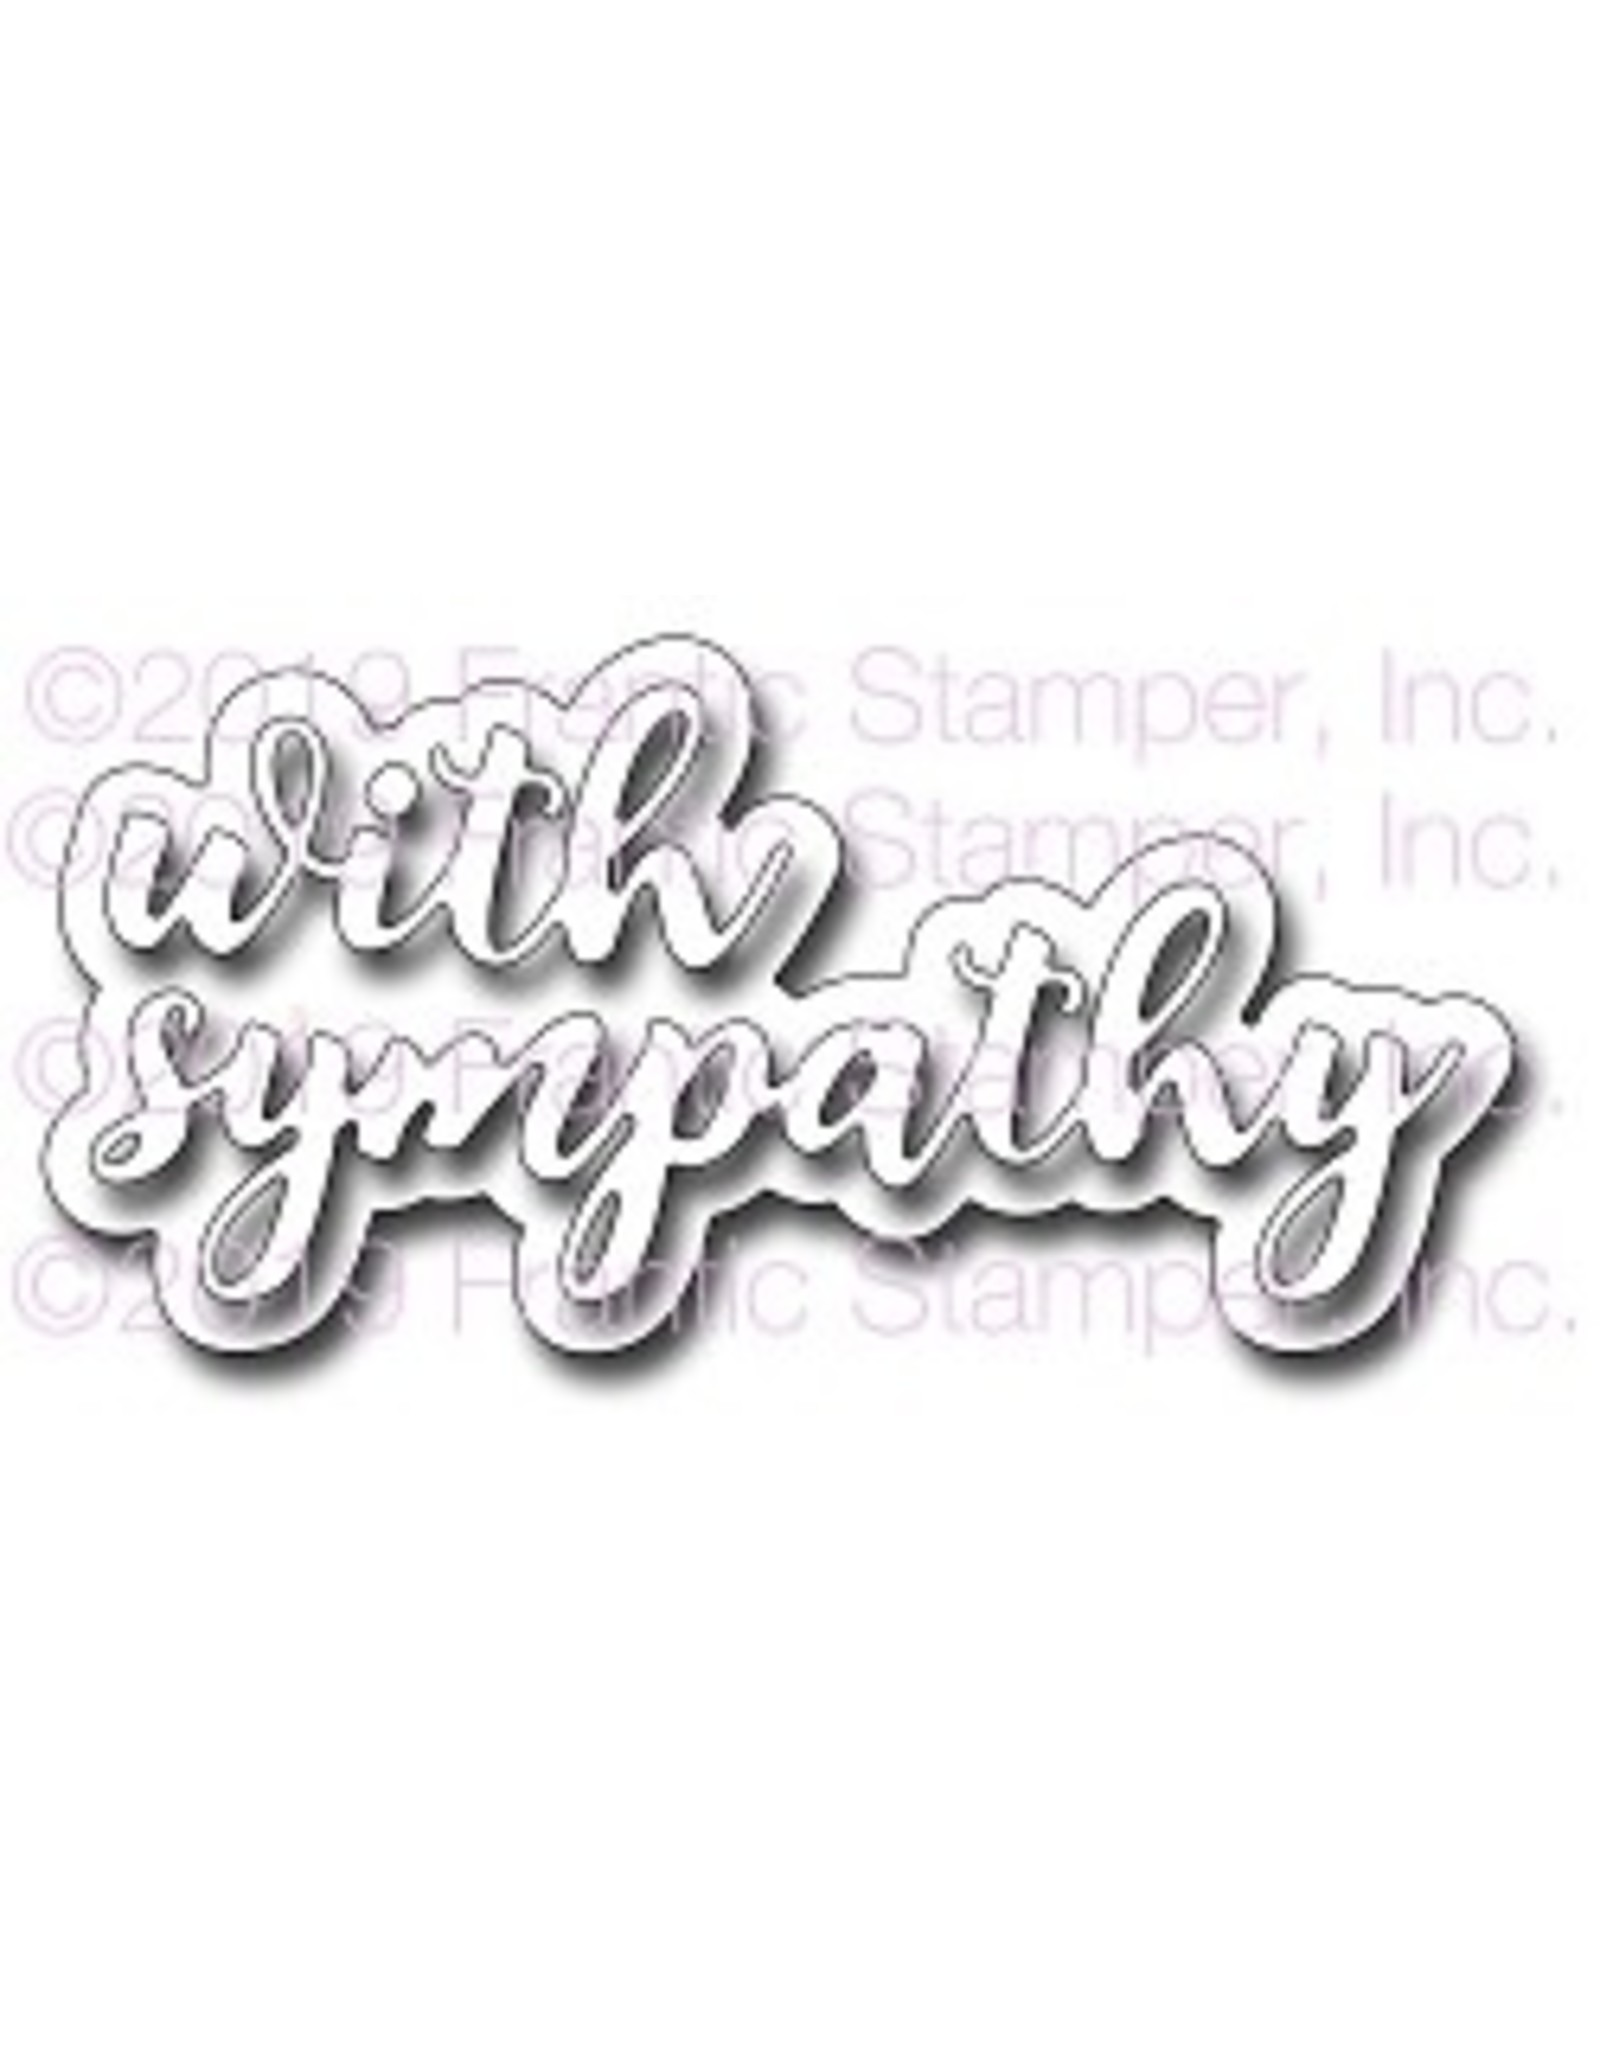 Frantic Stamper Inc Layered With Sympathy - Die